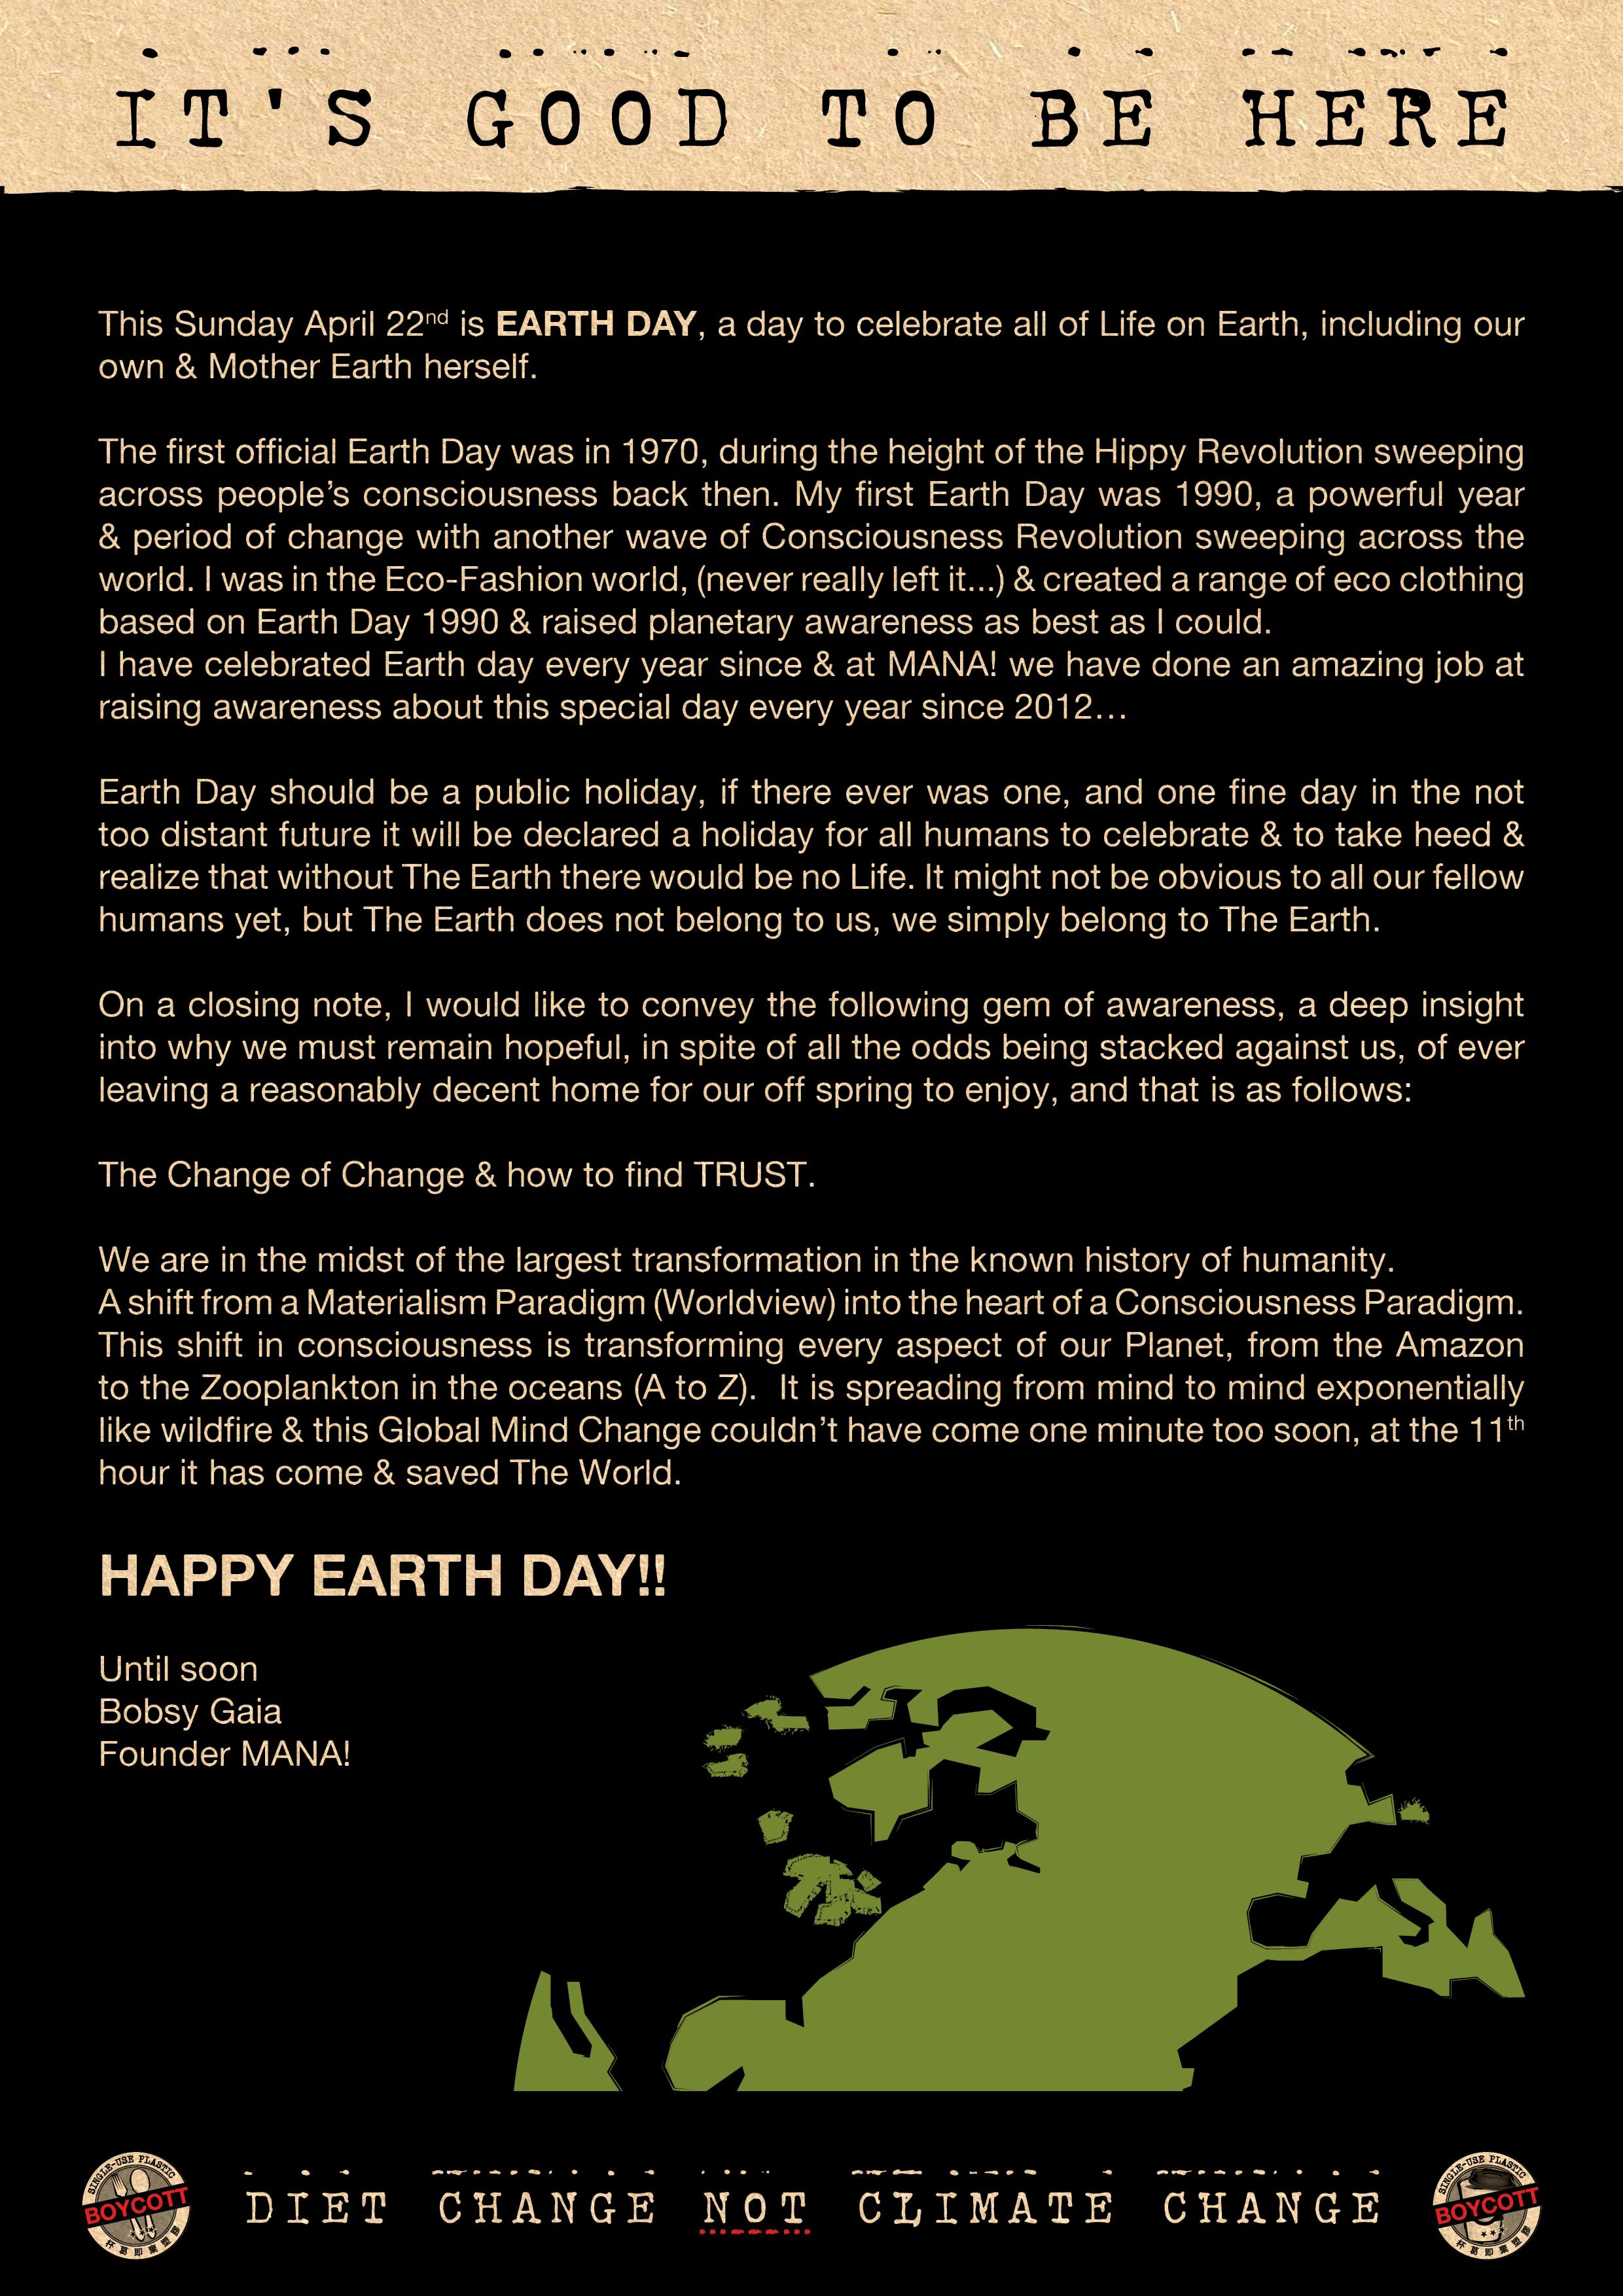 Bobsy's Blog - Earth Day Message.jpg